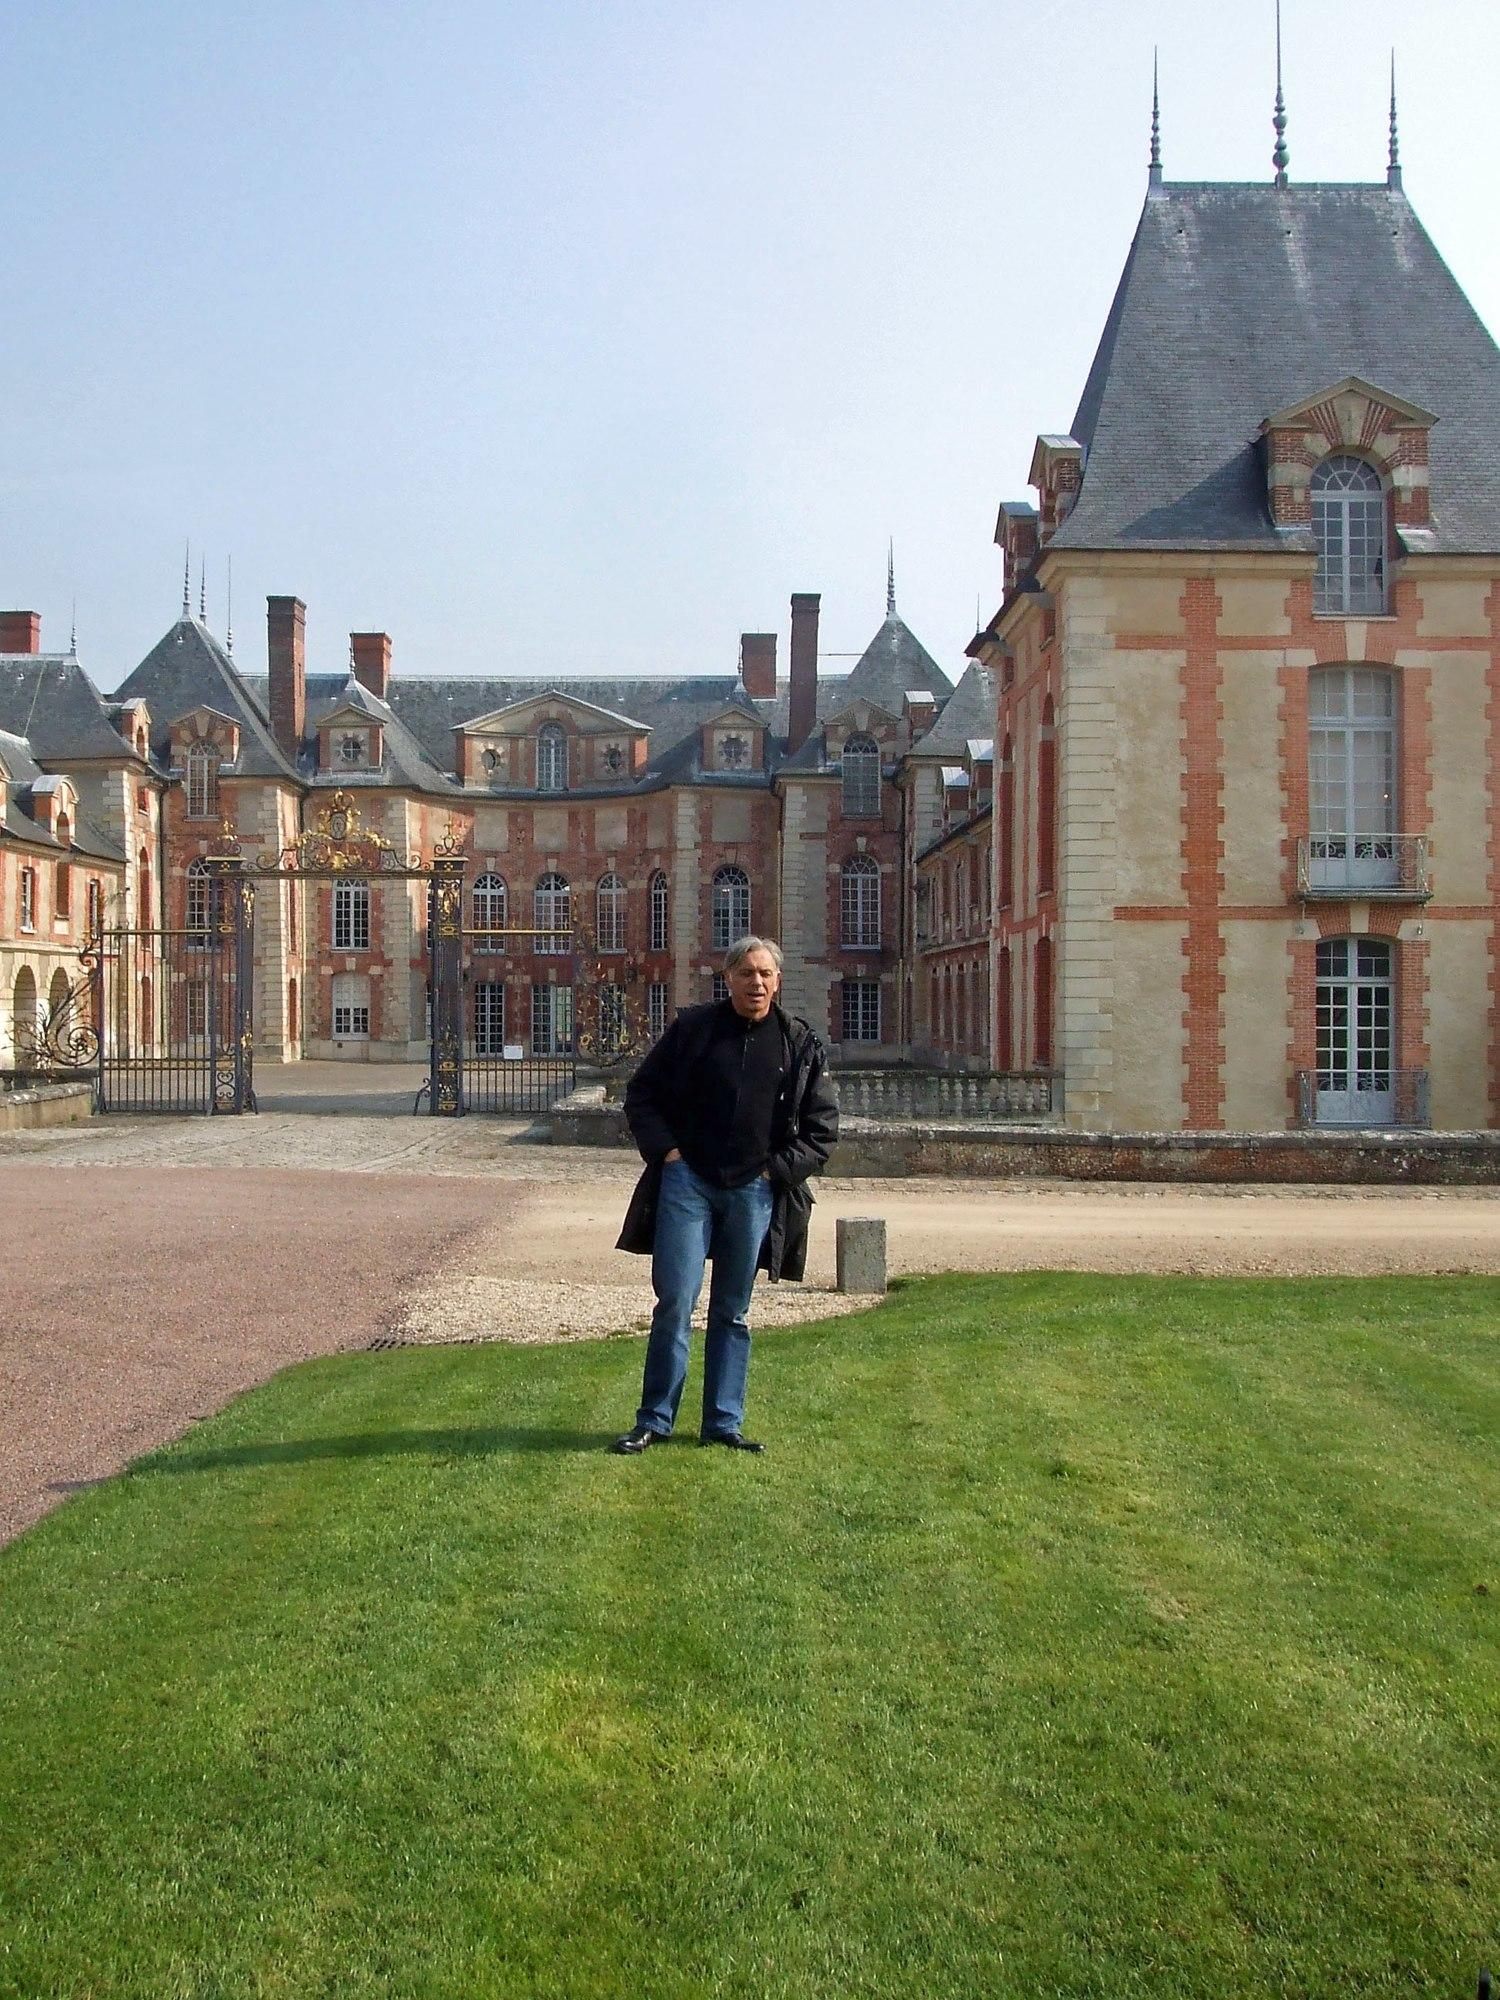 Cha-teau-de-Grosbois-avec-Ste-phane-The-baut